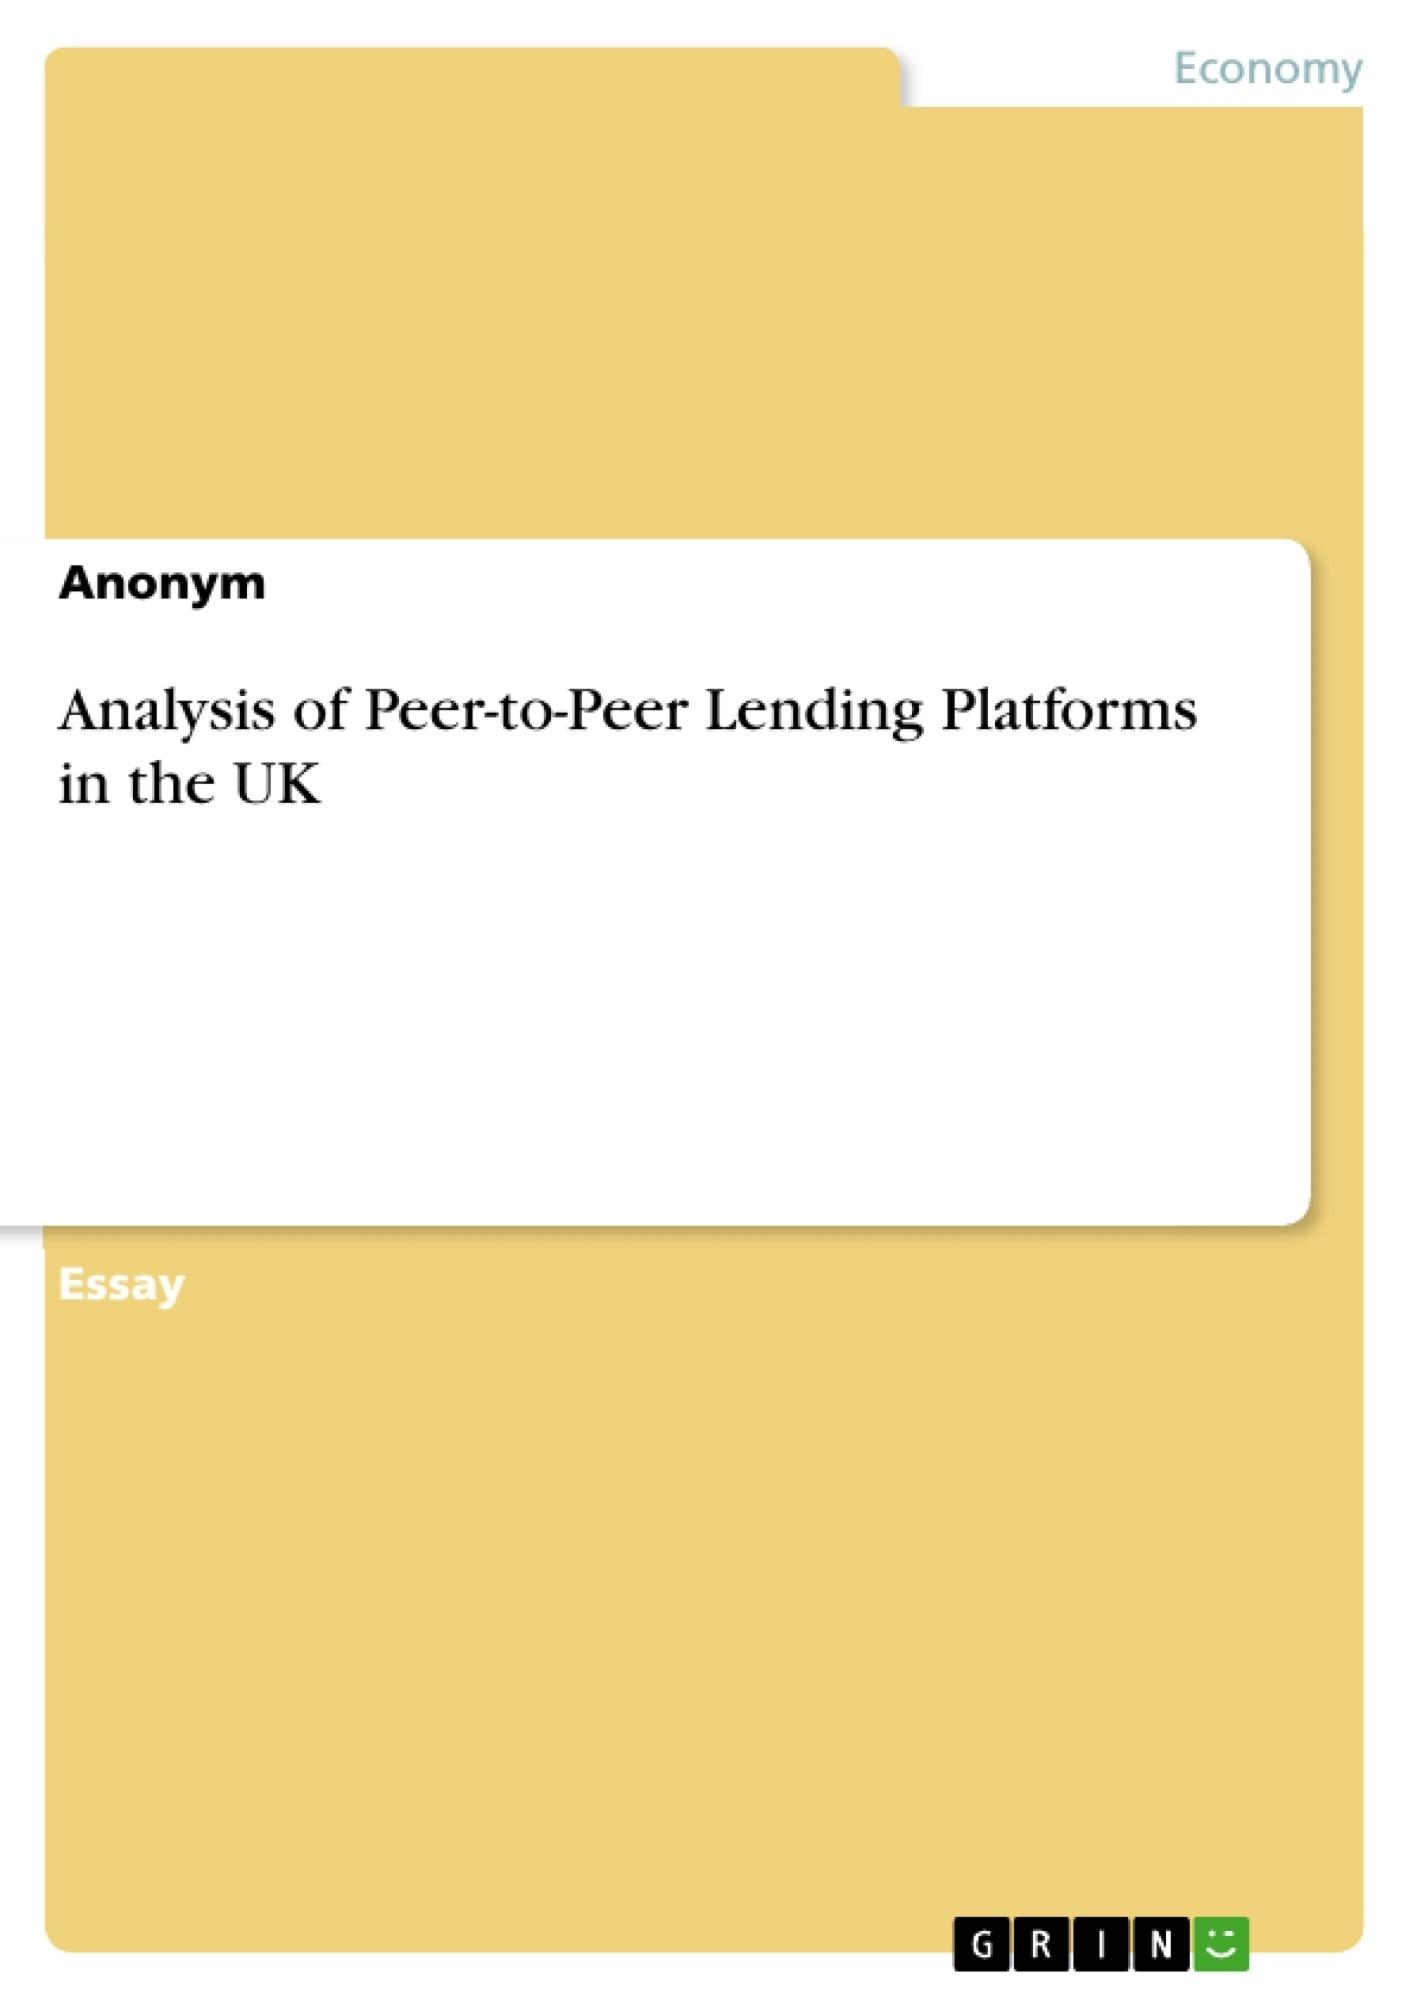 Title: Analysis of Peer-to-Peer Lending Platforms in the UK